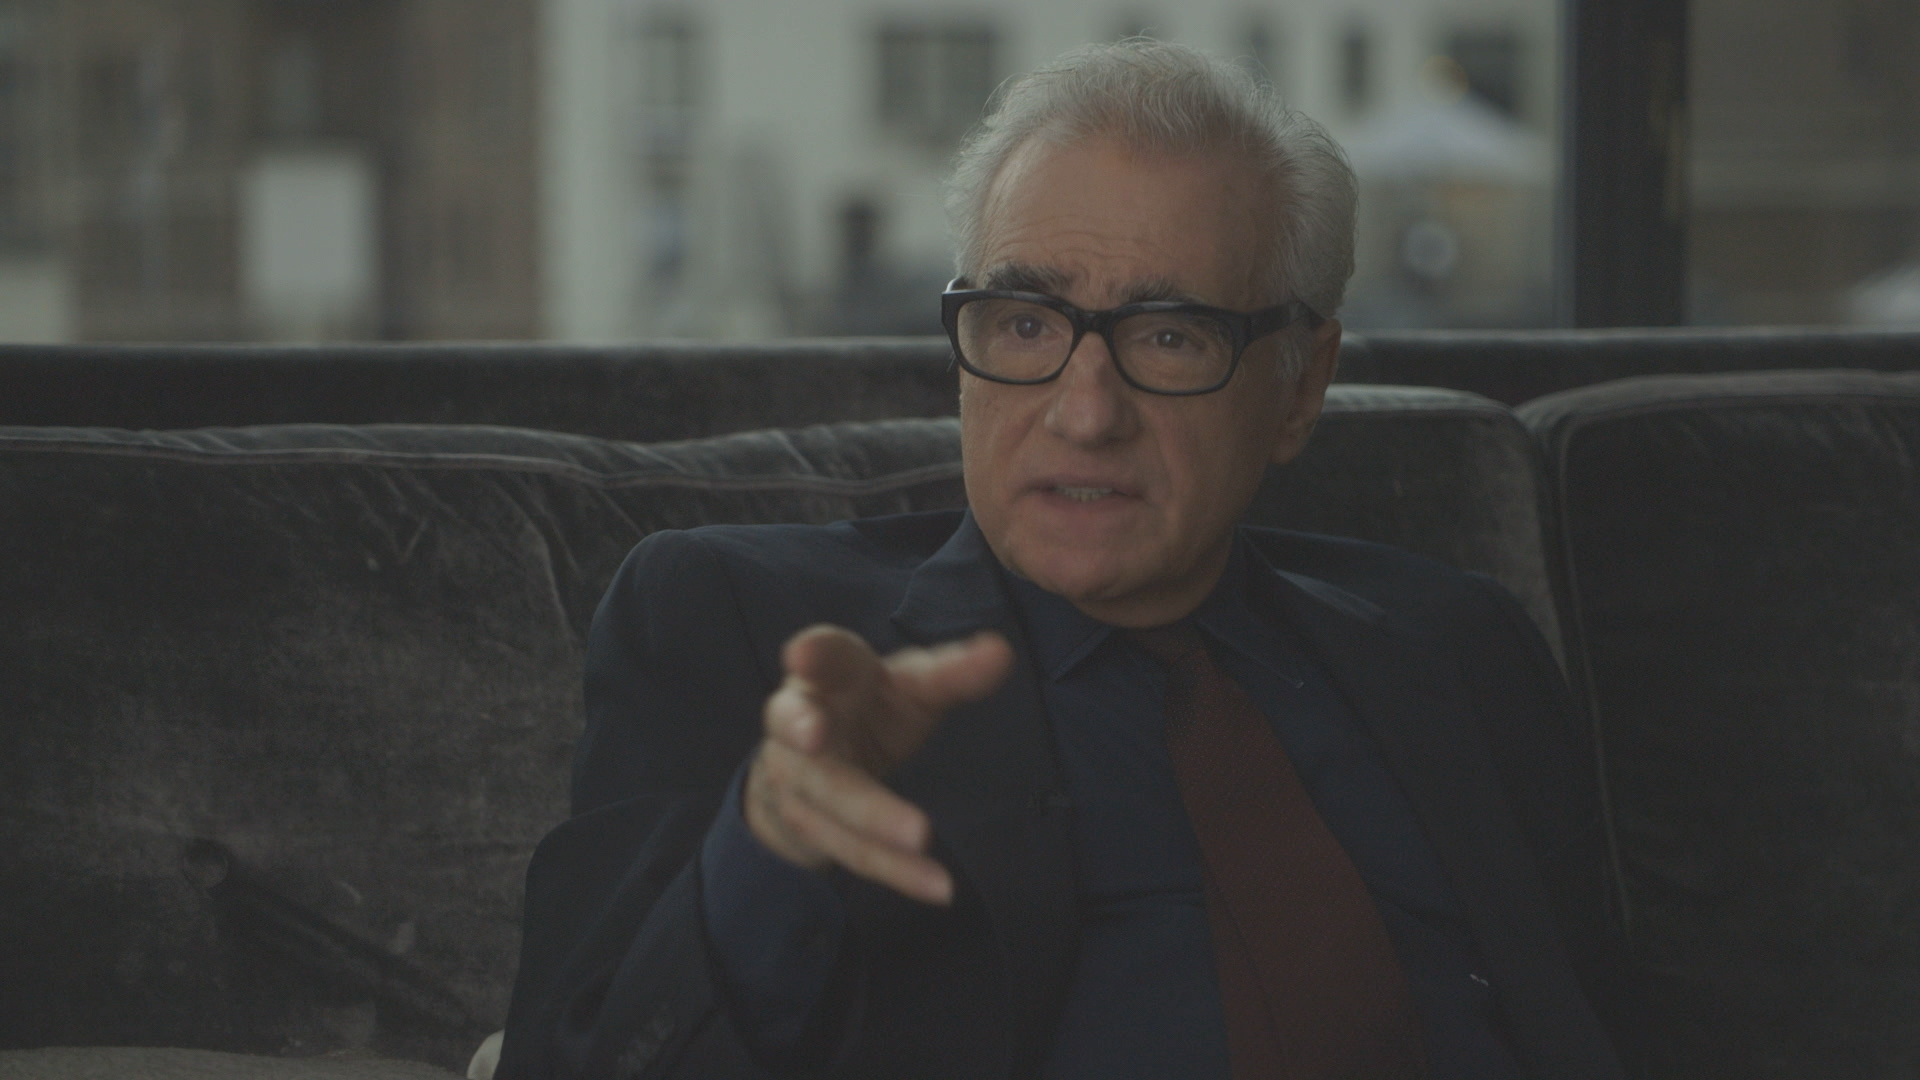 4 - Martin Scorsese